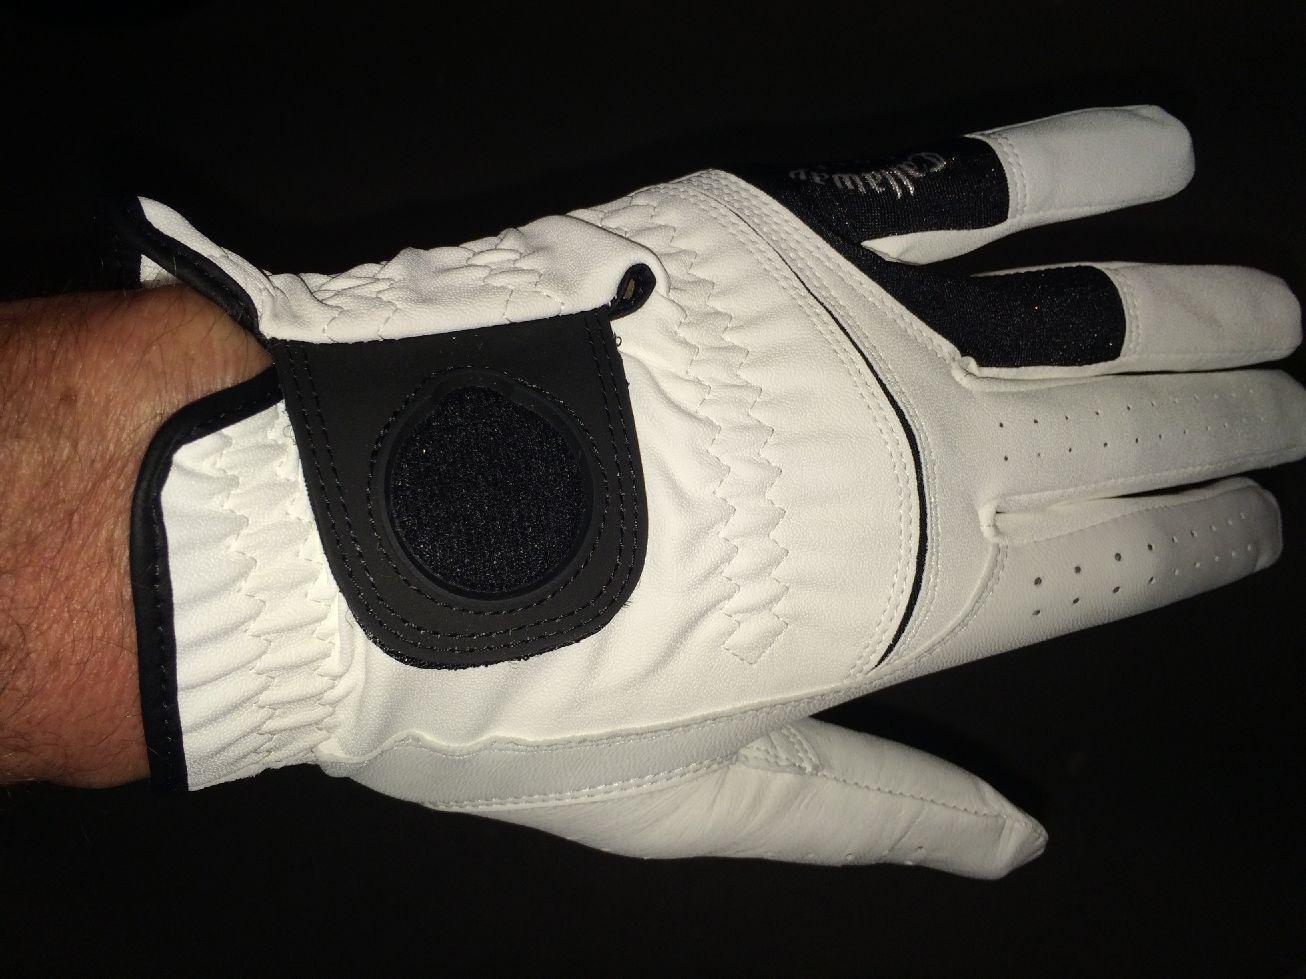 Manufacturer of Cabretta Leather Golf Gloves.